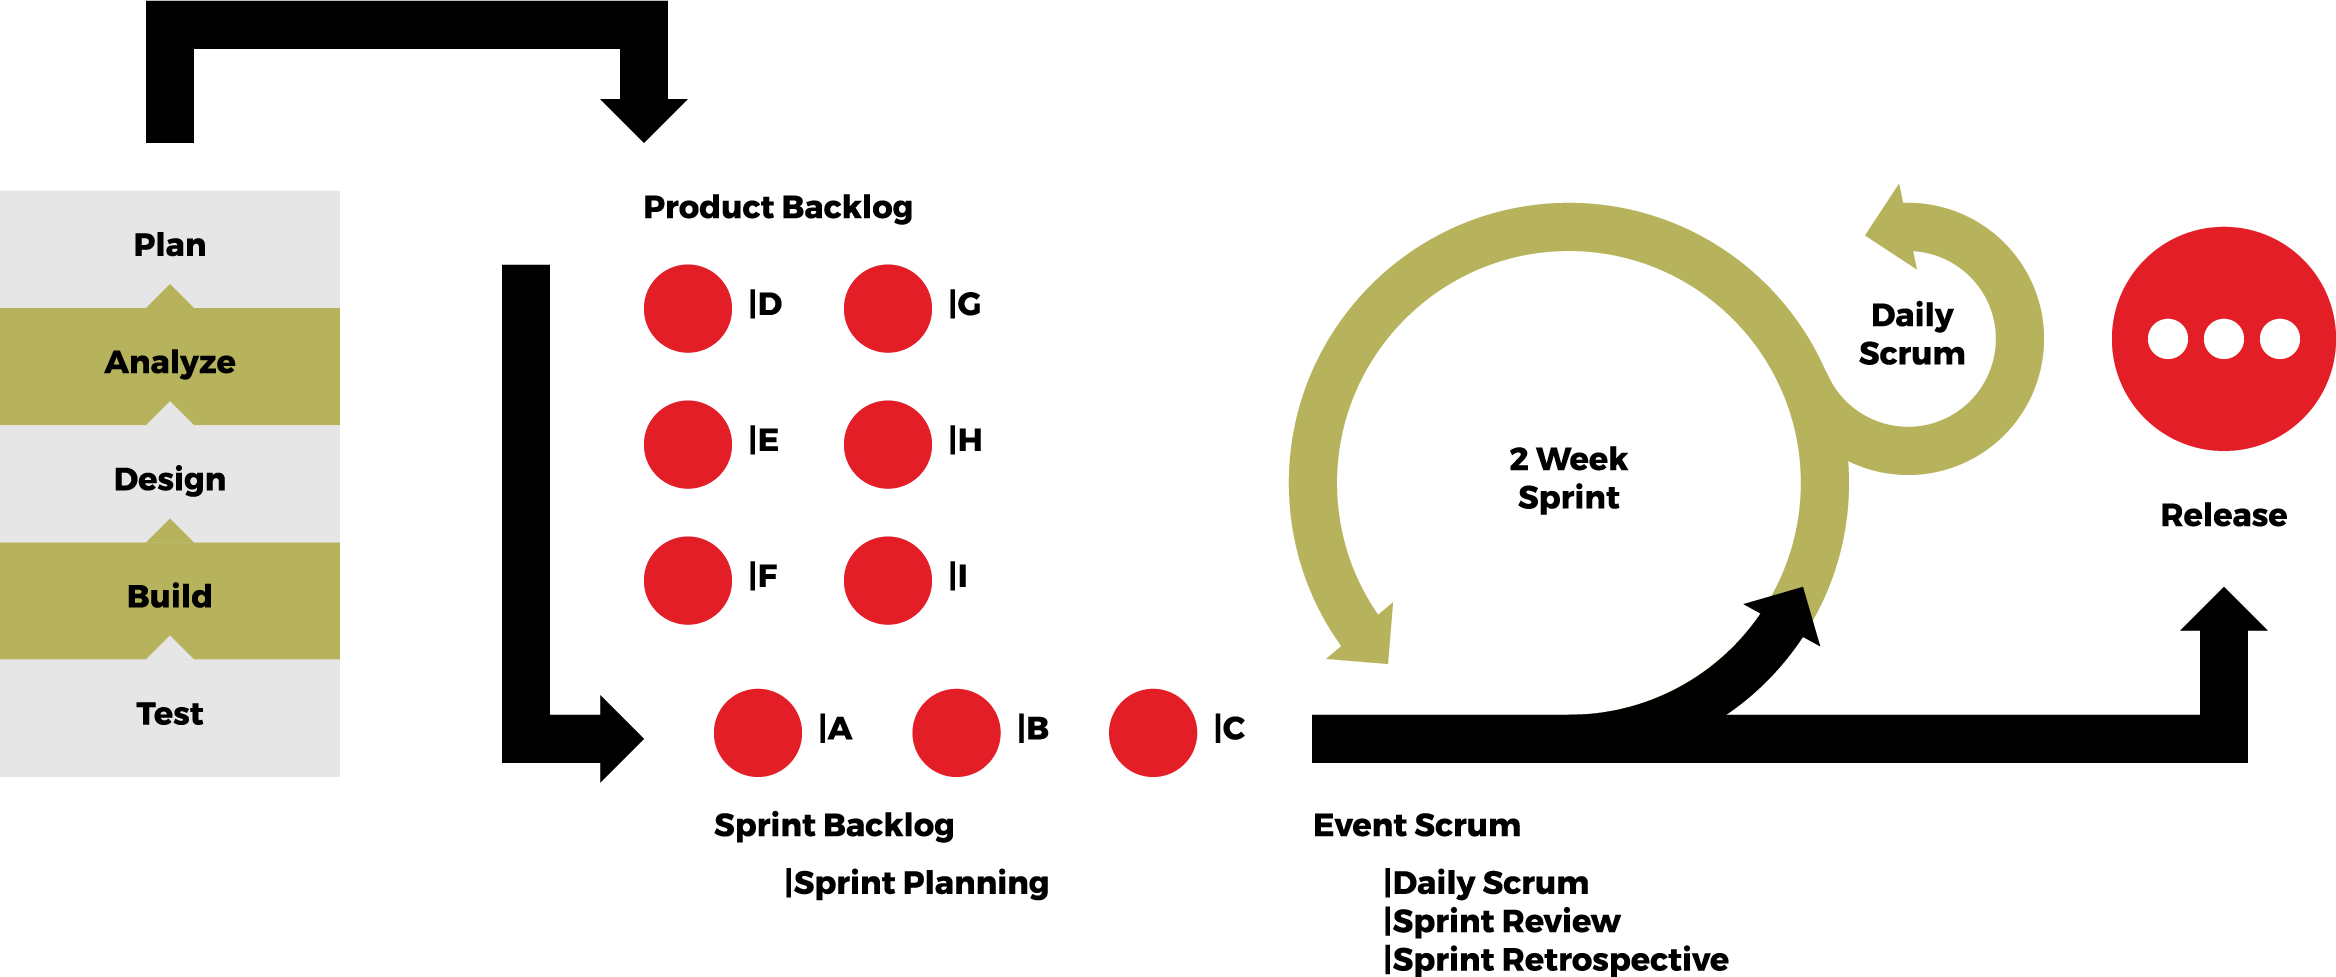 Process image.